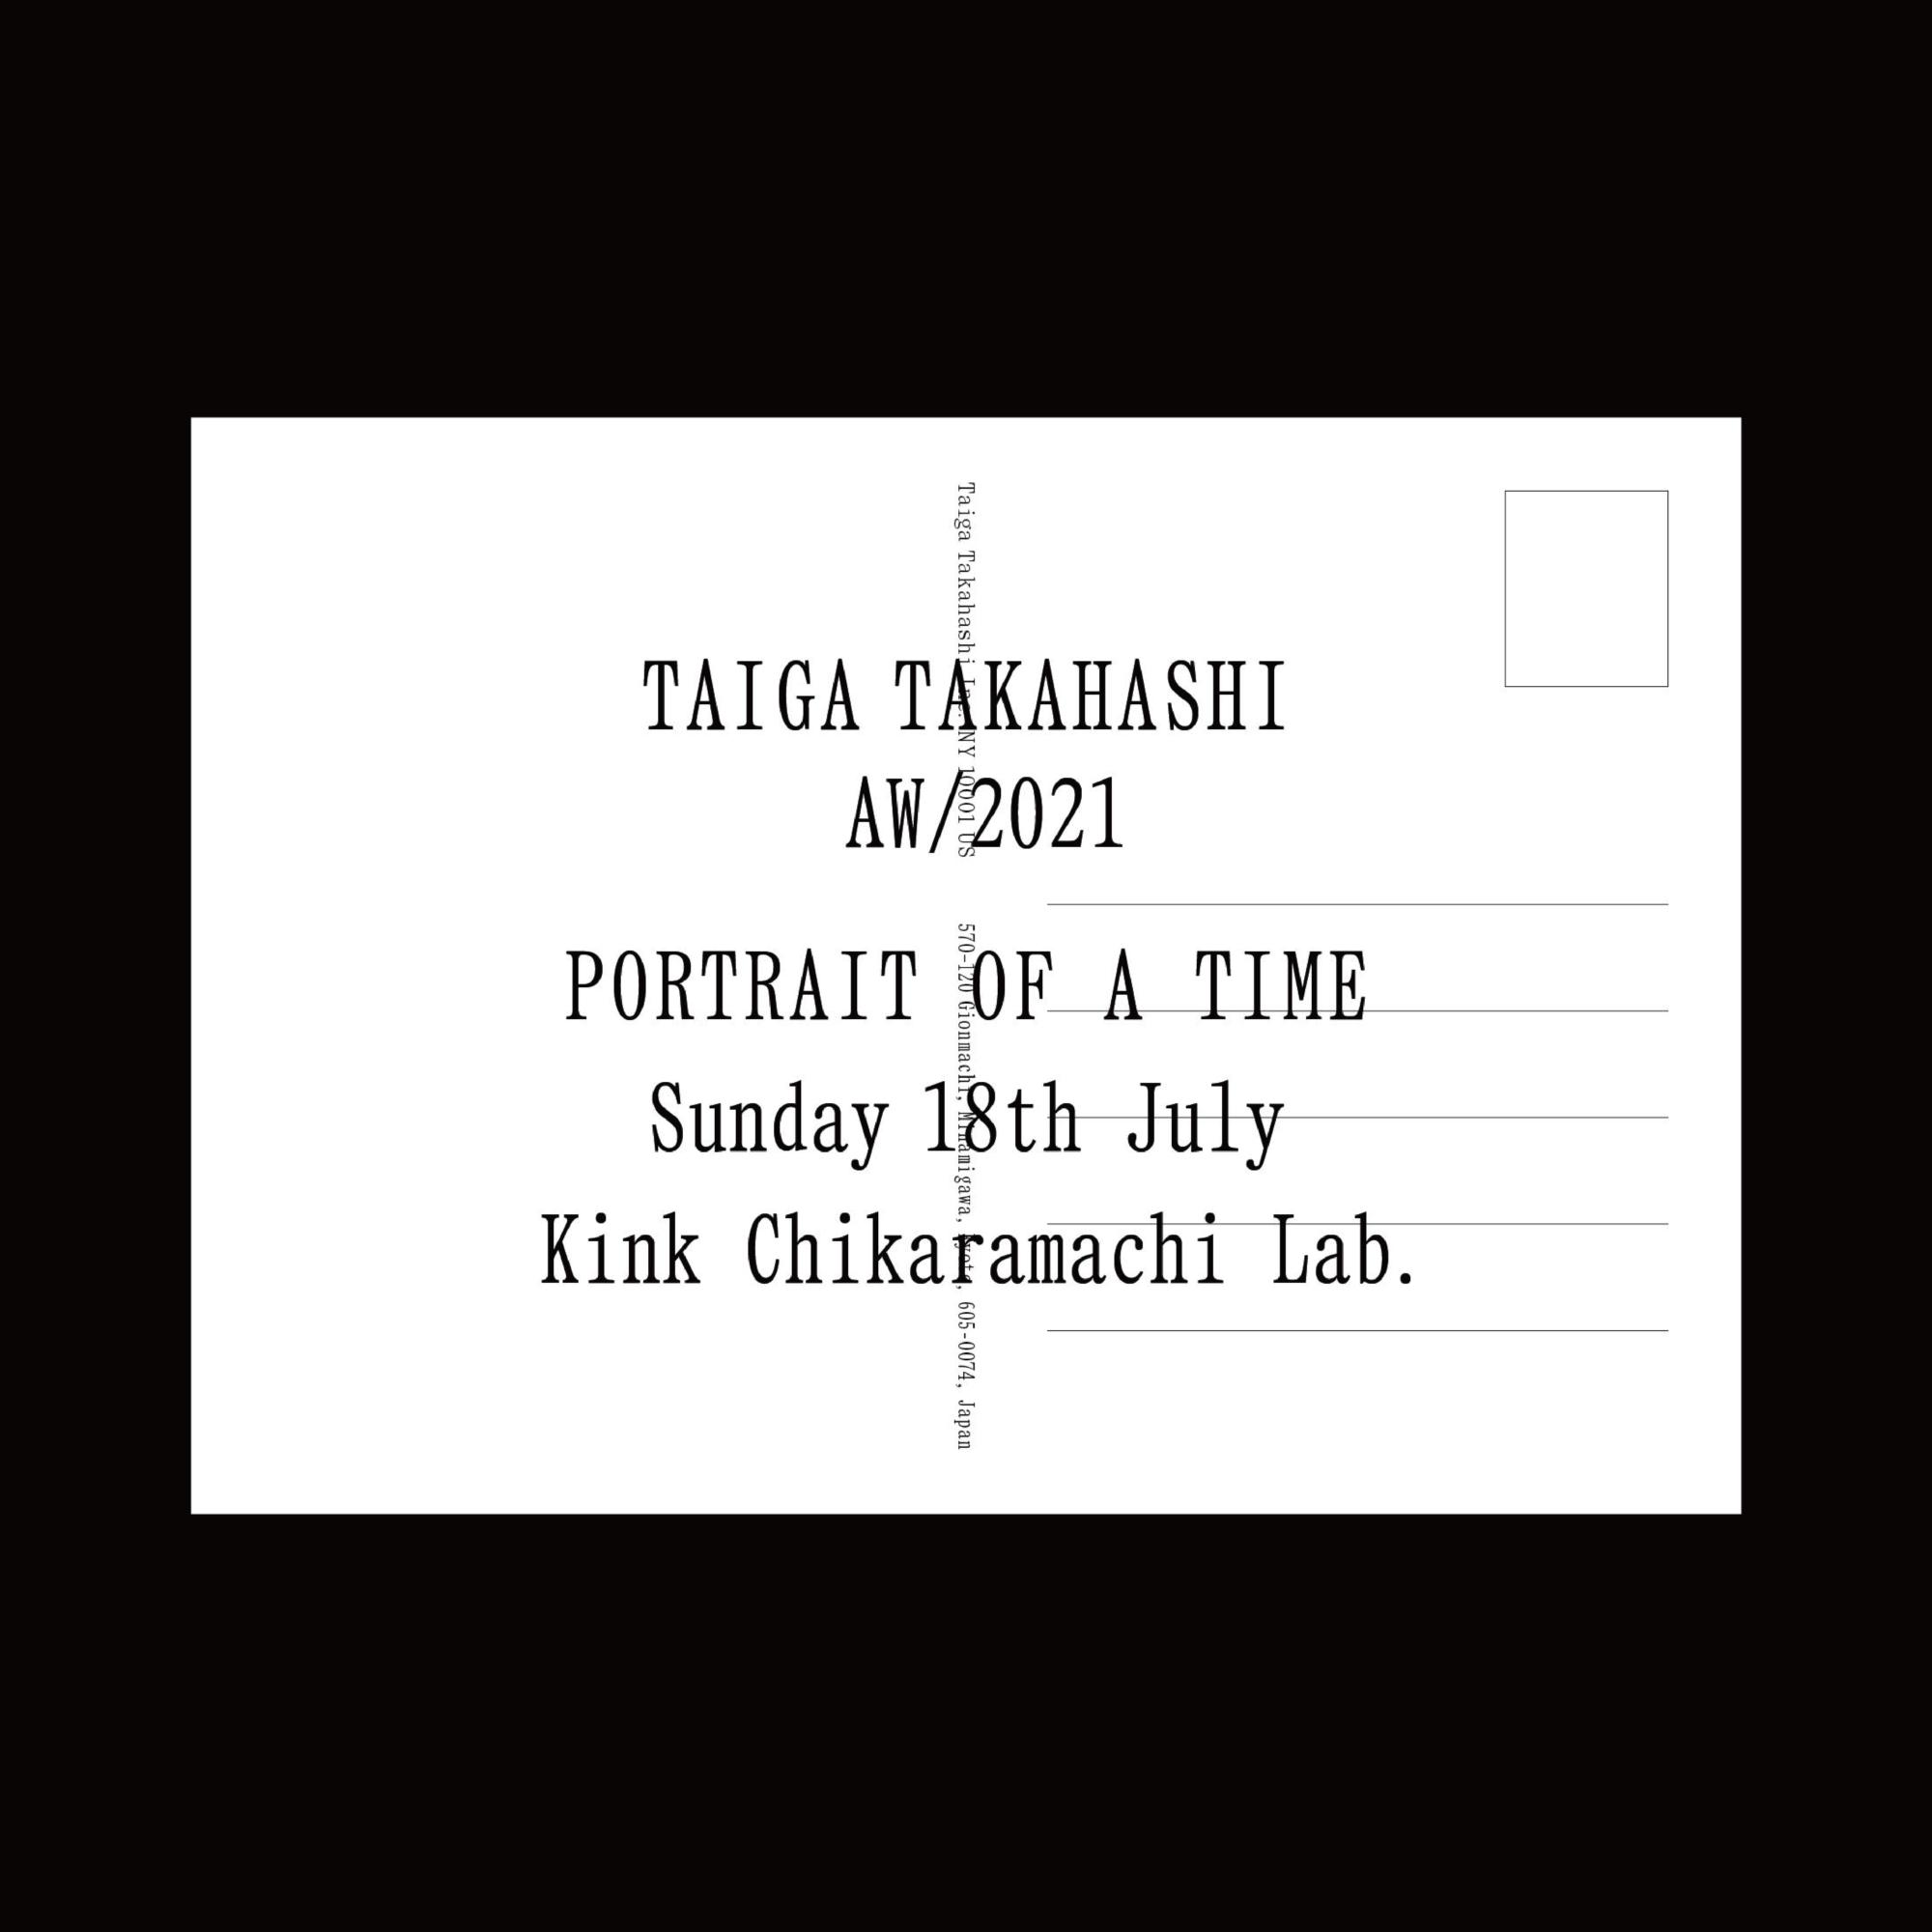 TAIGA TAKAHASHI